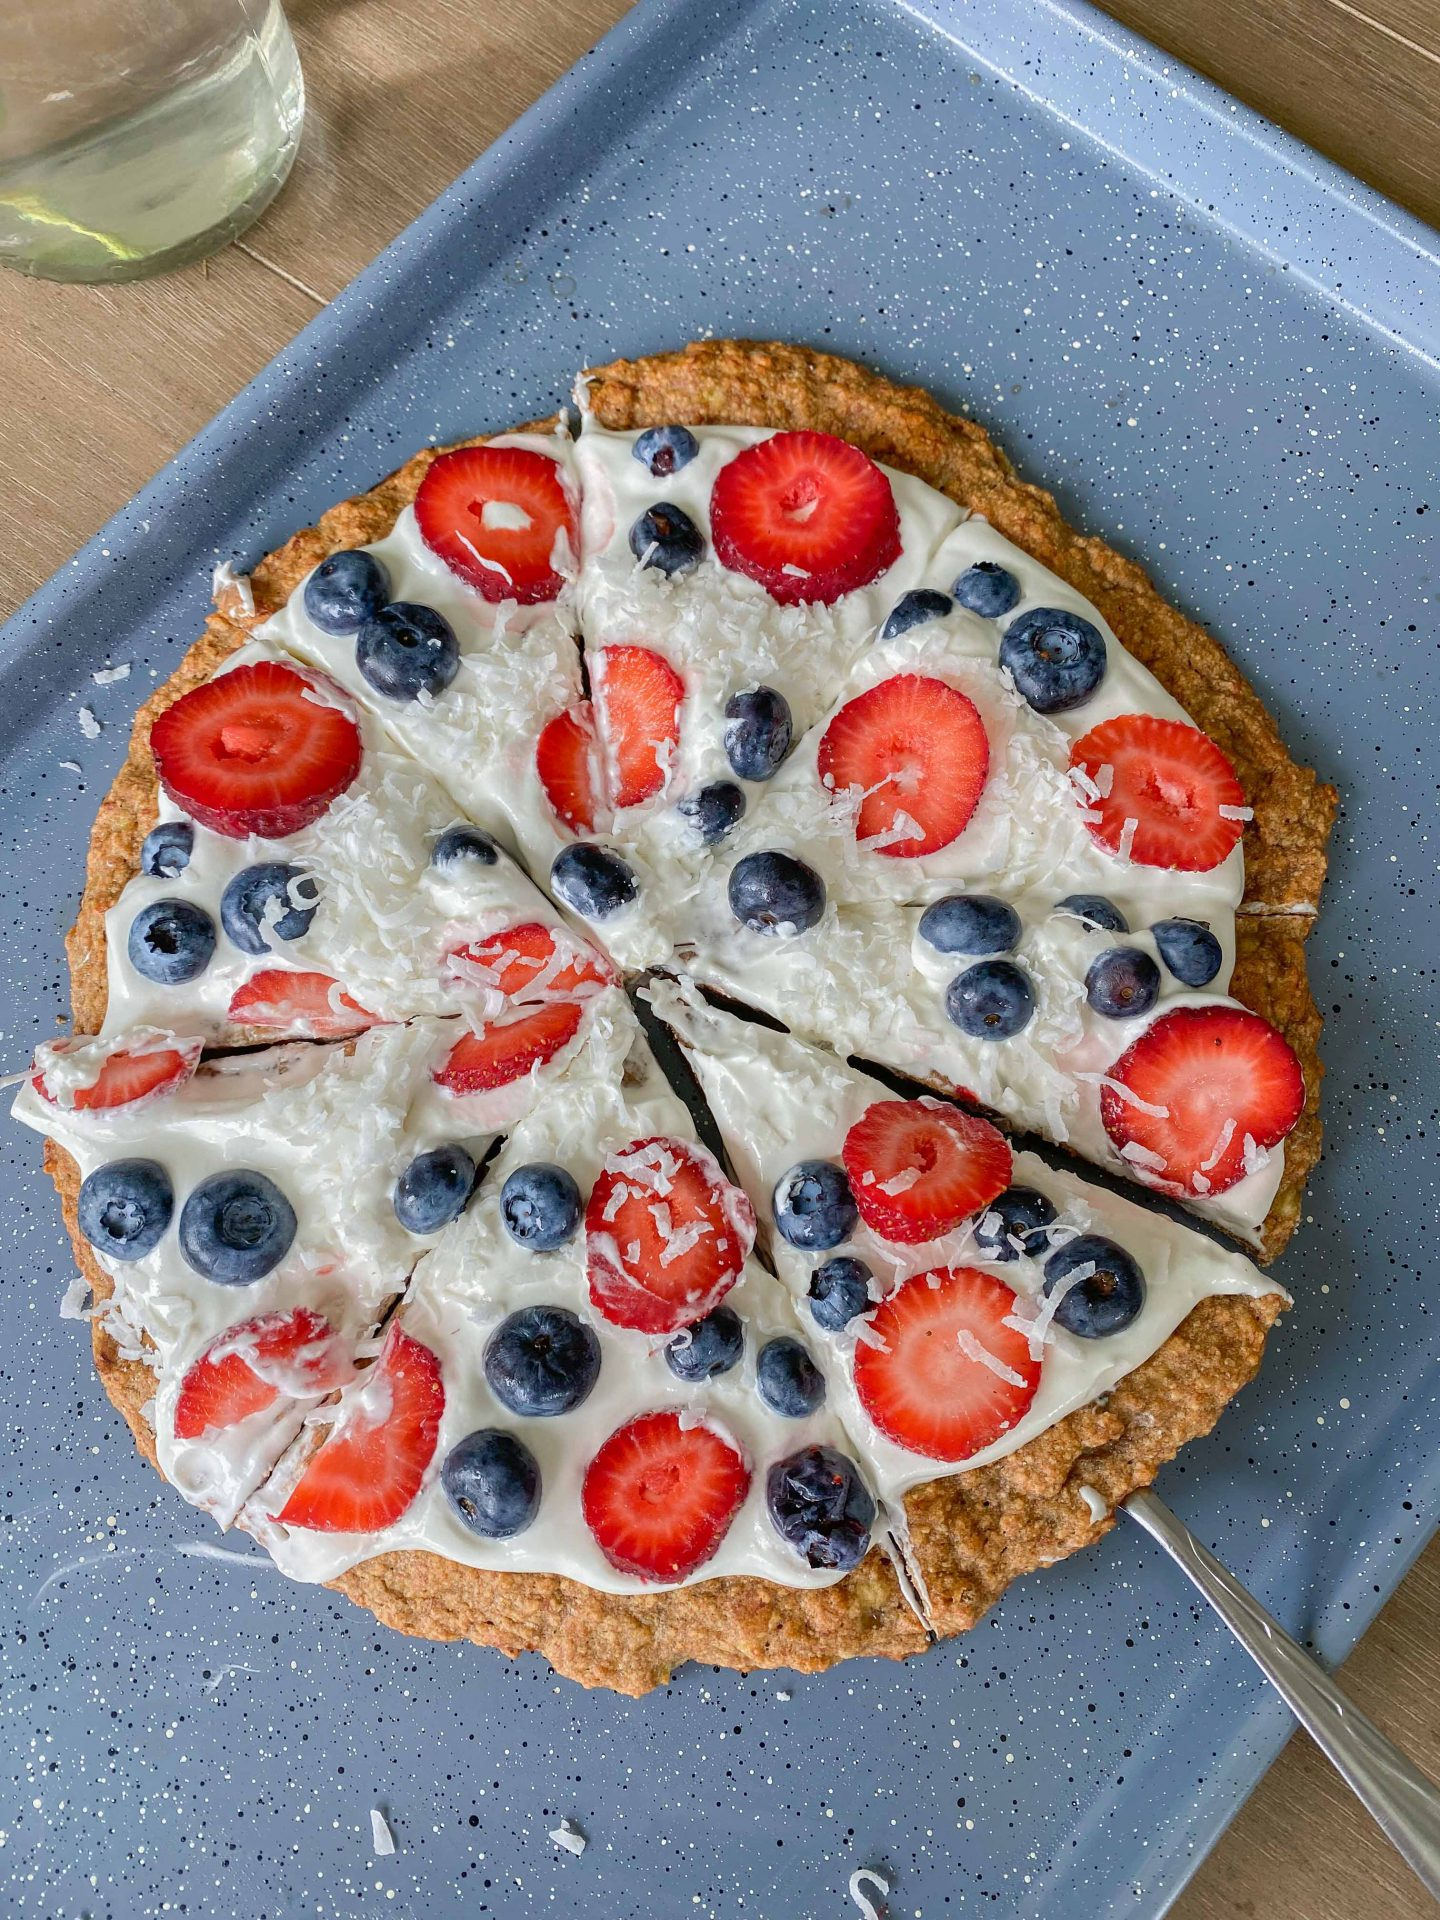 graham cracker crust, fruit pizza, dessert pizza, fourth of July, 4th of July, berries, gluten-free, dairy free, banana crust